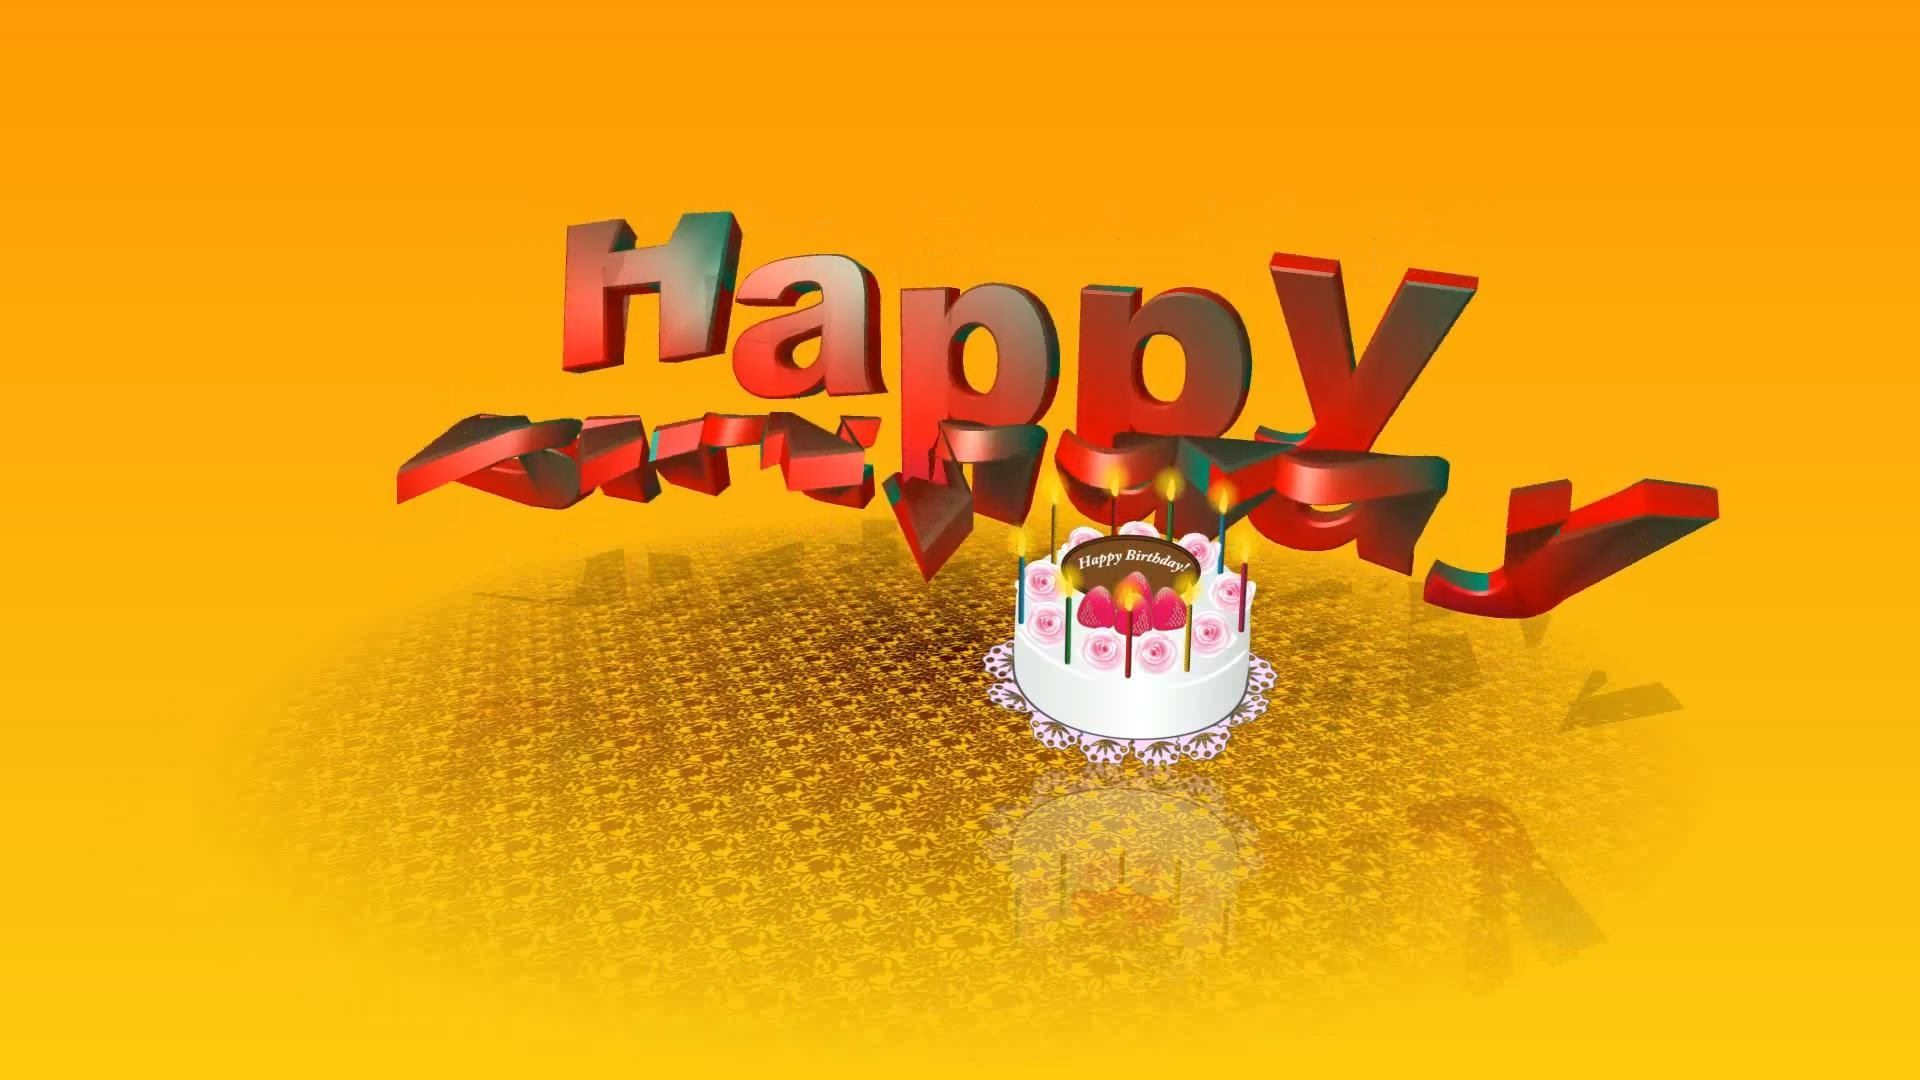 Happy Birthday Wishes Animated Greetings to Wish